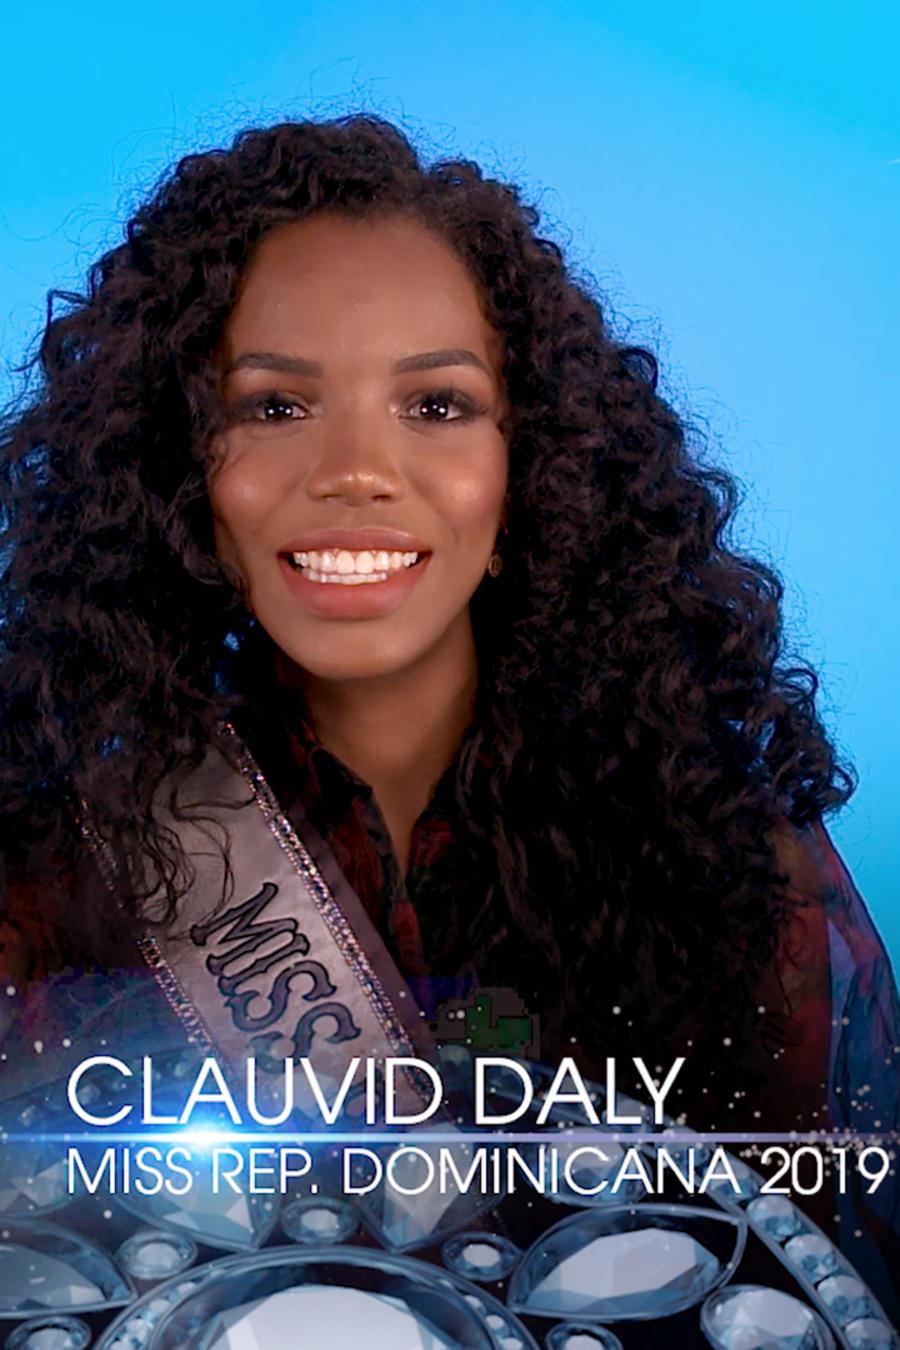 Clauvid Daly, Miss República Dominicana en Miss Universo 2019